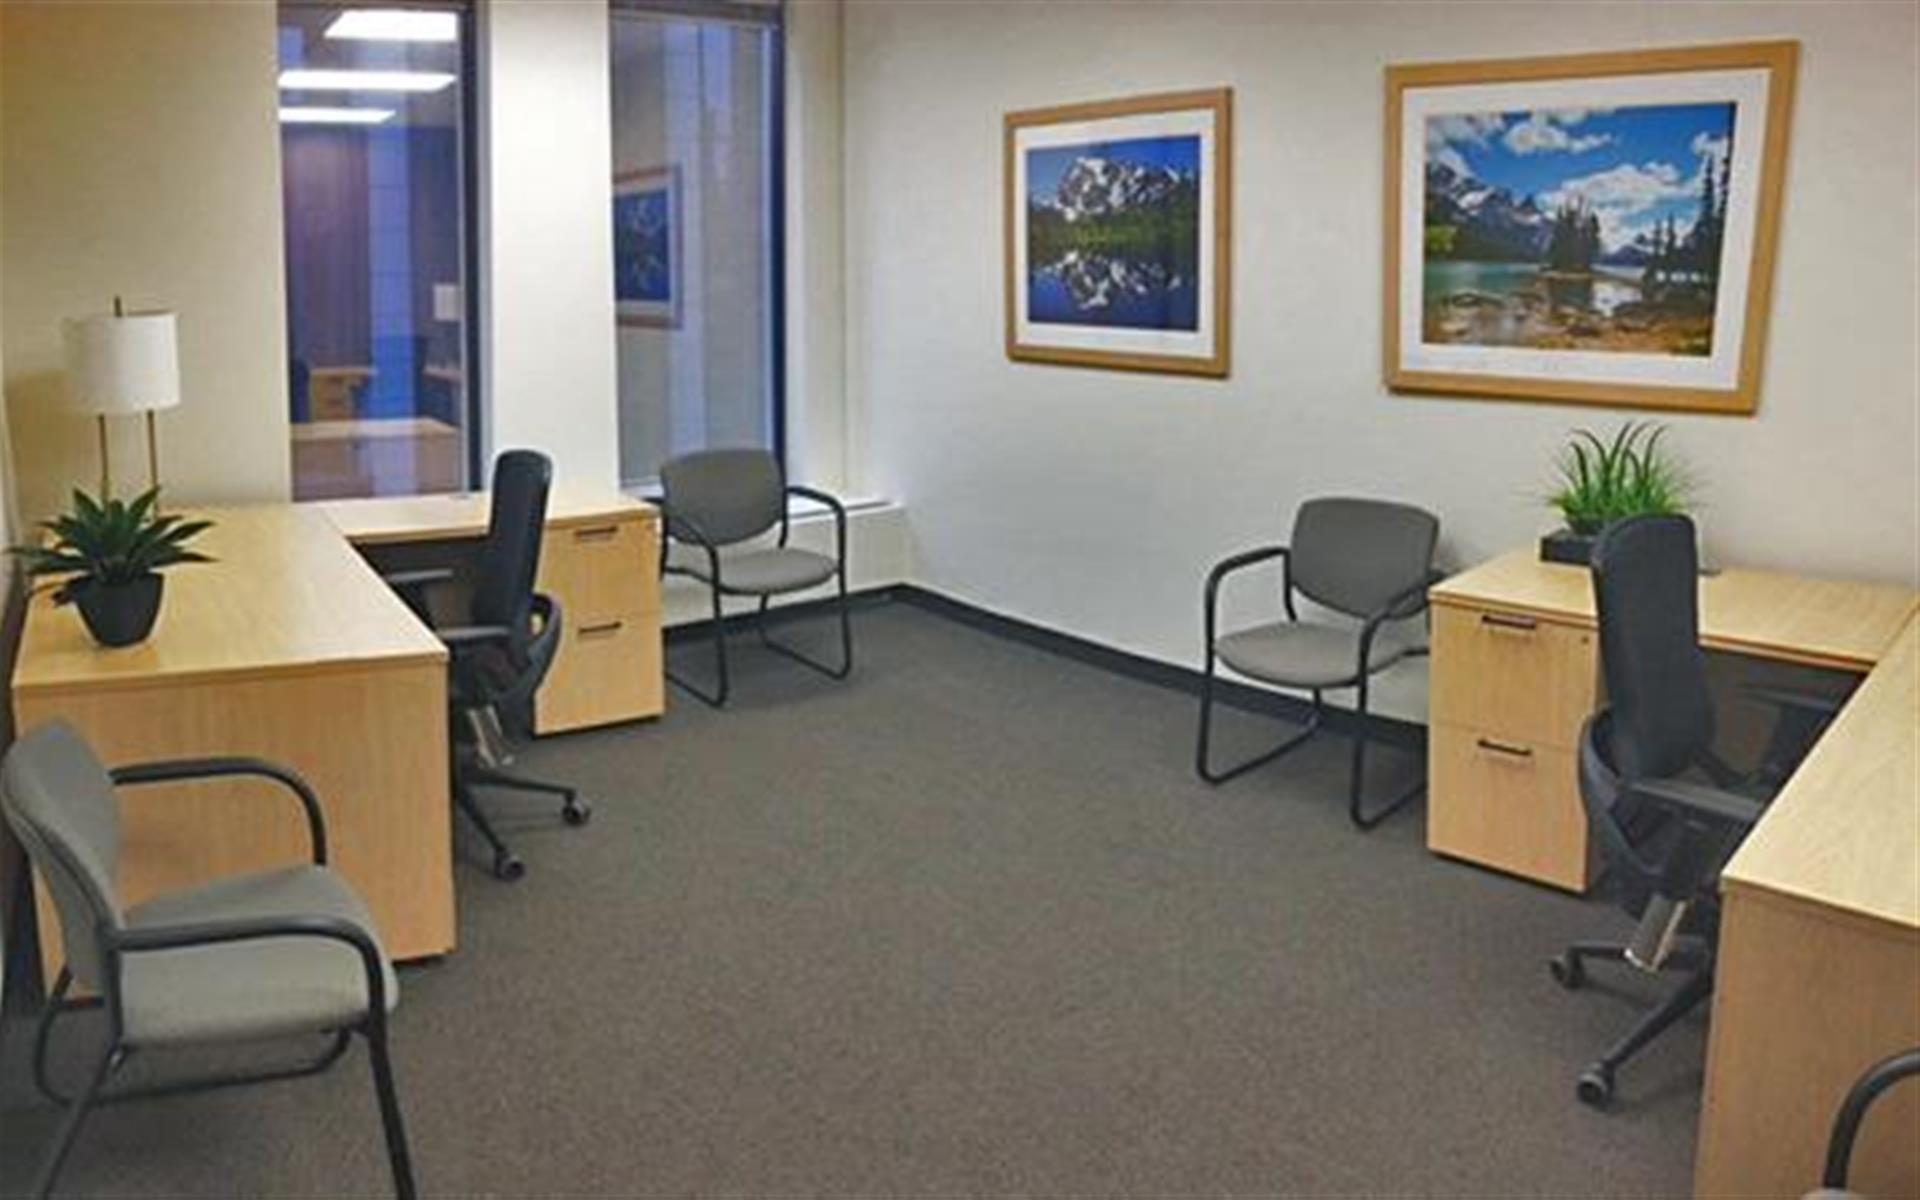 Intelligent Office Chicago Mag Mile - Executive Suite 1006